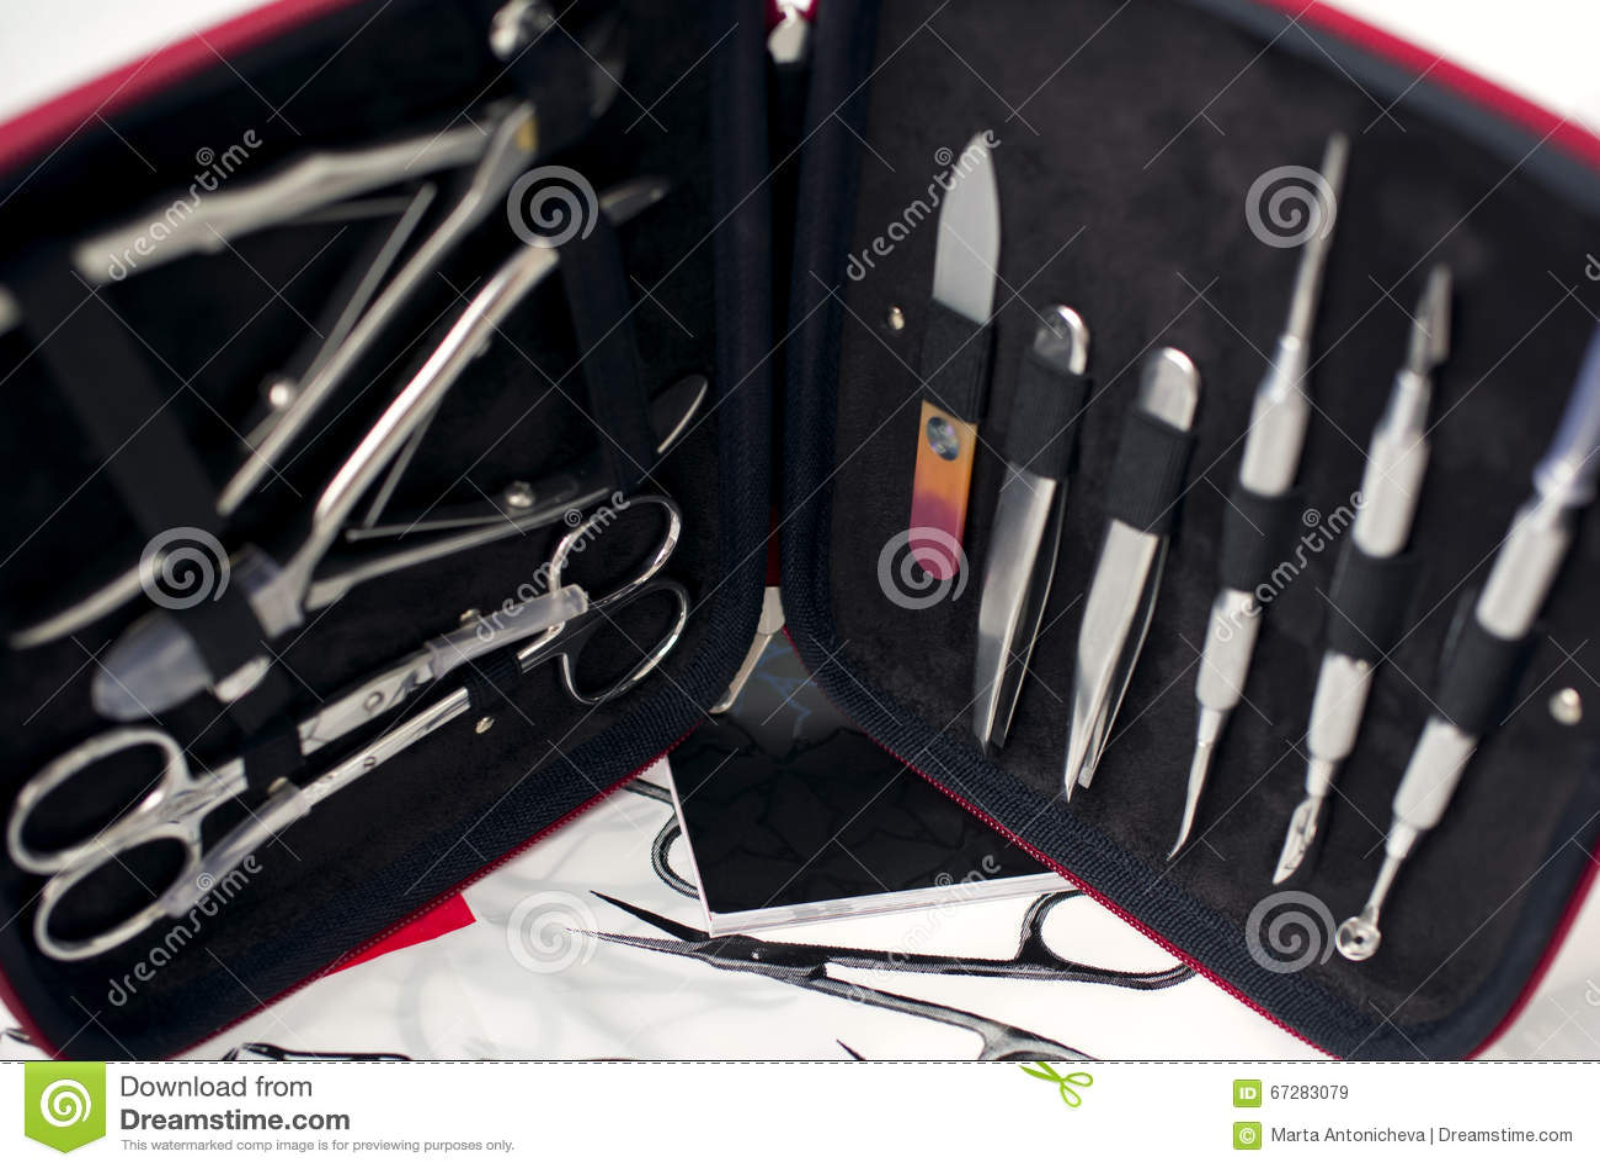 Set dla manicure u i pedicure u